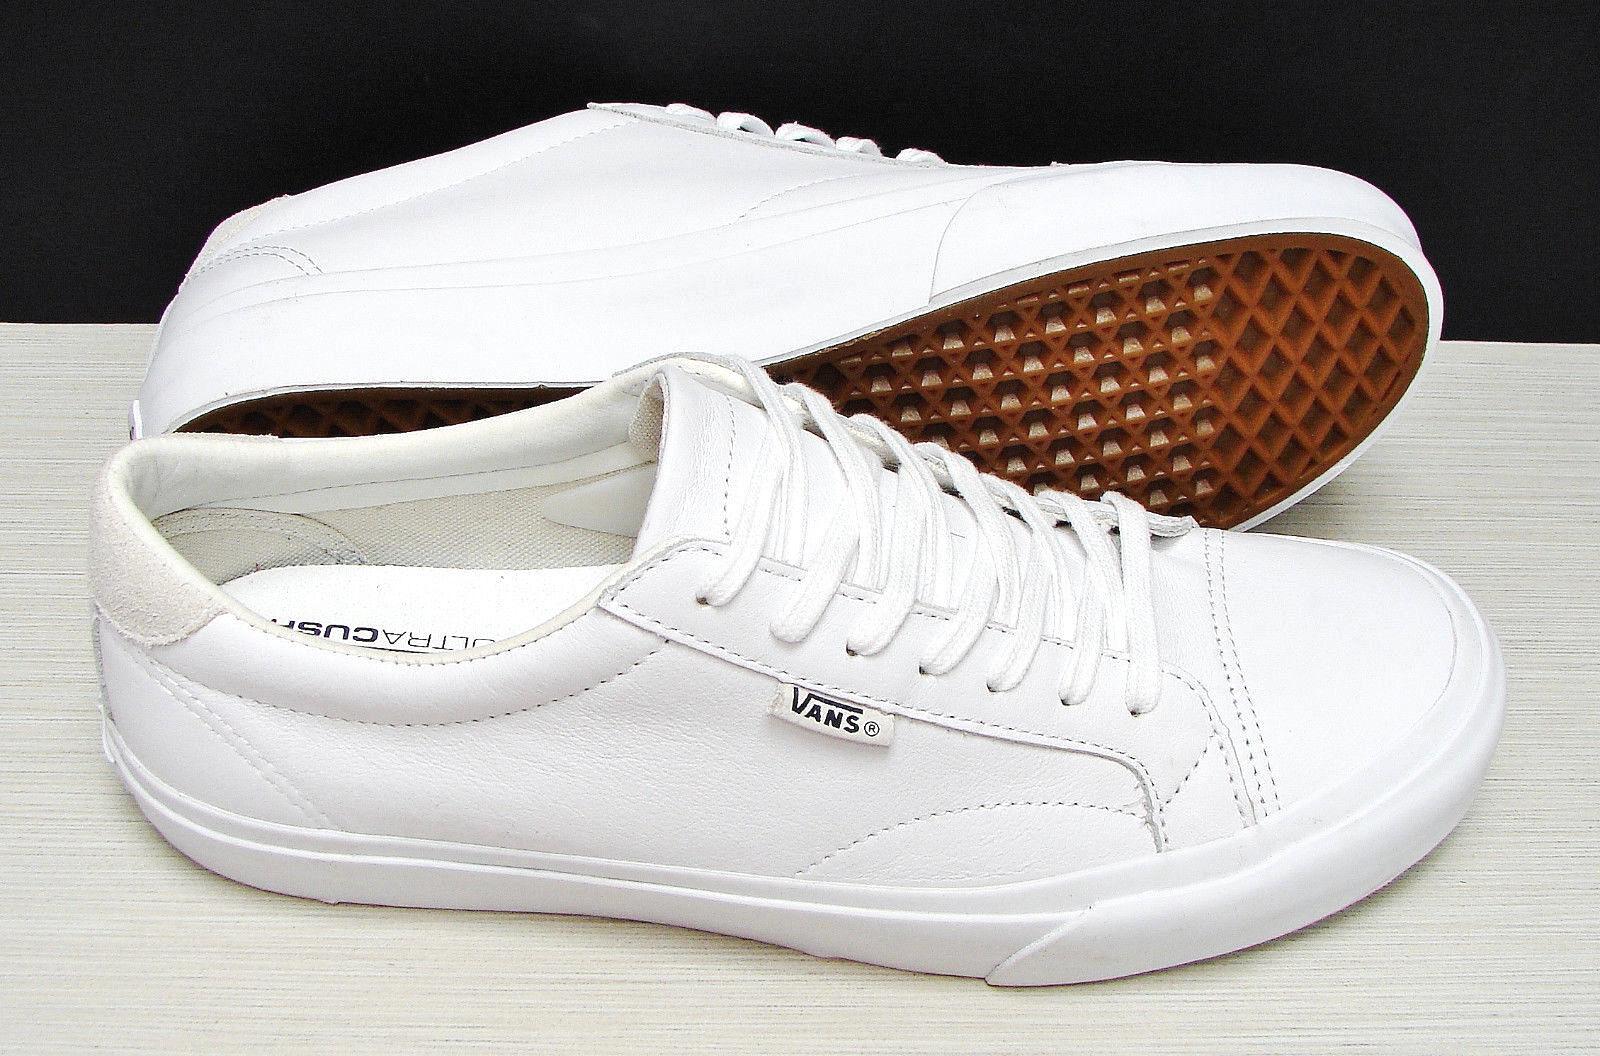 Vans Court DX Leather True White VN0A2Z5OL3H Men's Size: 7.5